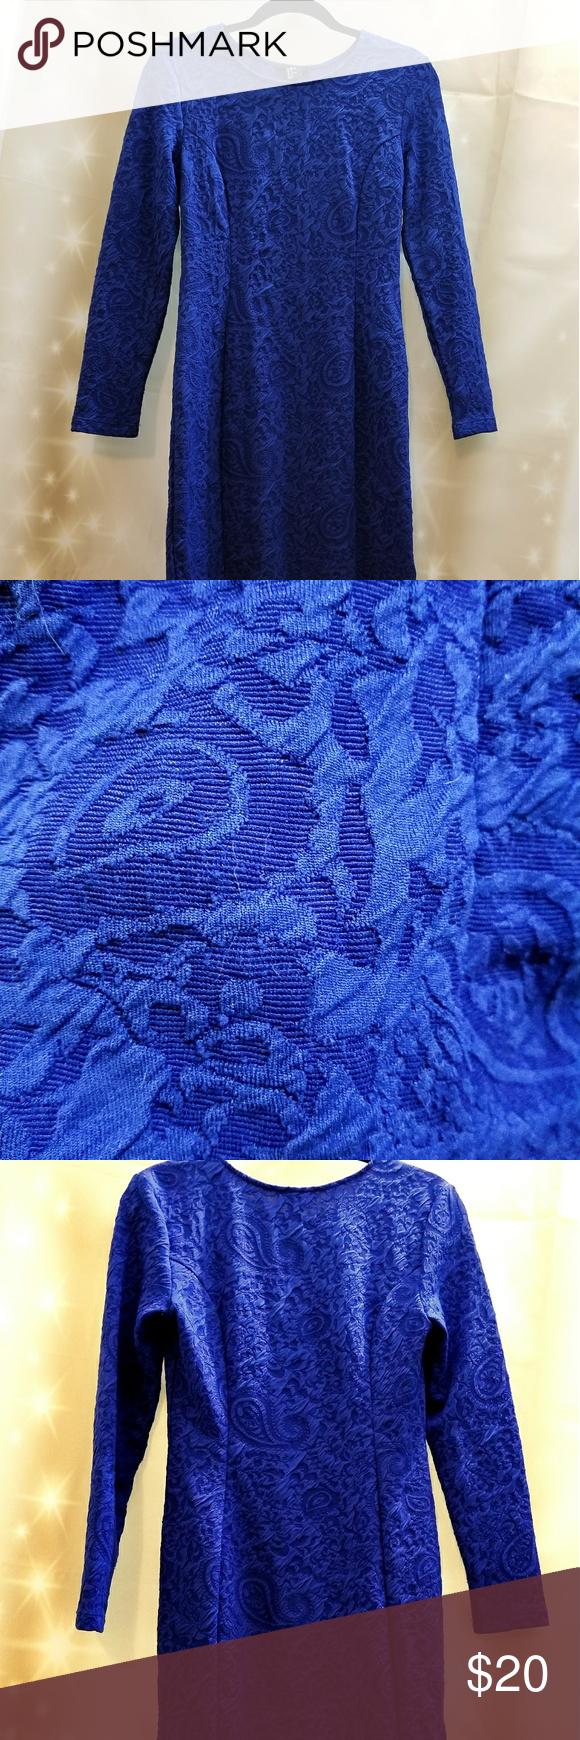 H&m blue lace dress  HuM dress  My Posh Closet  Pinterest  Lace print Stretch lace